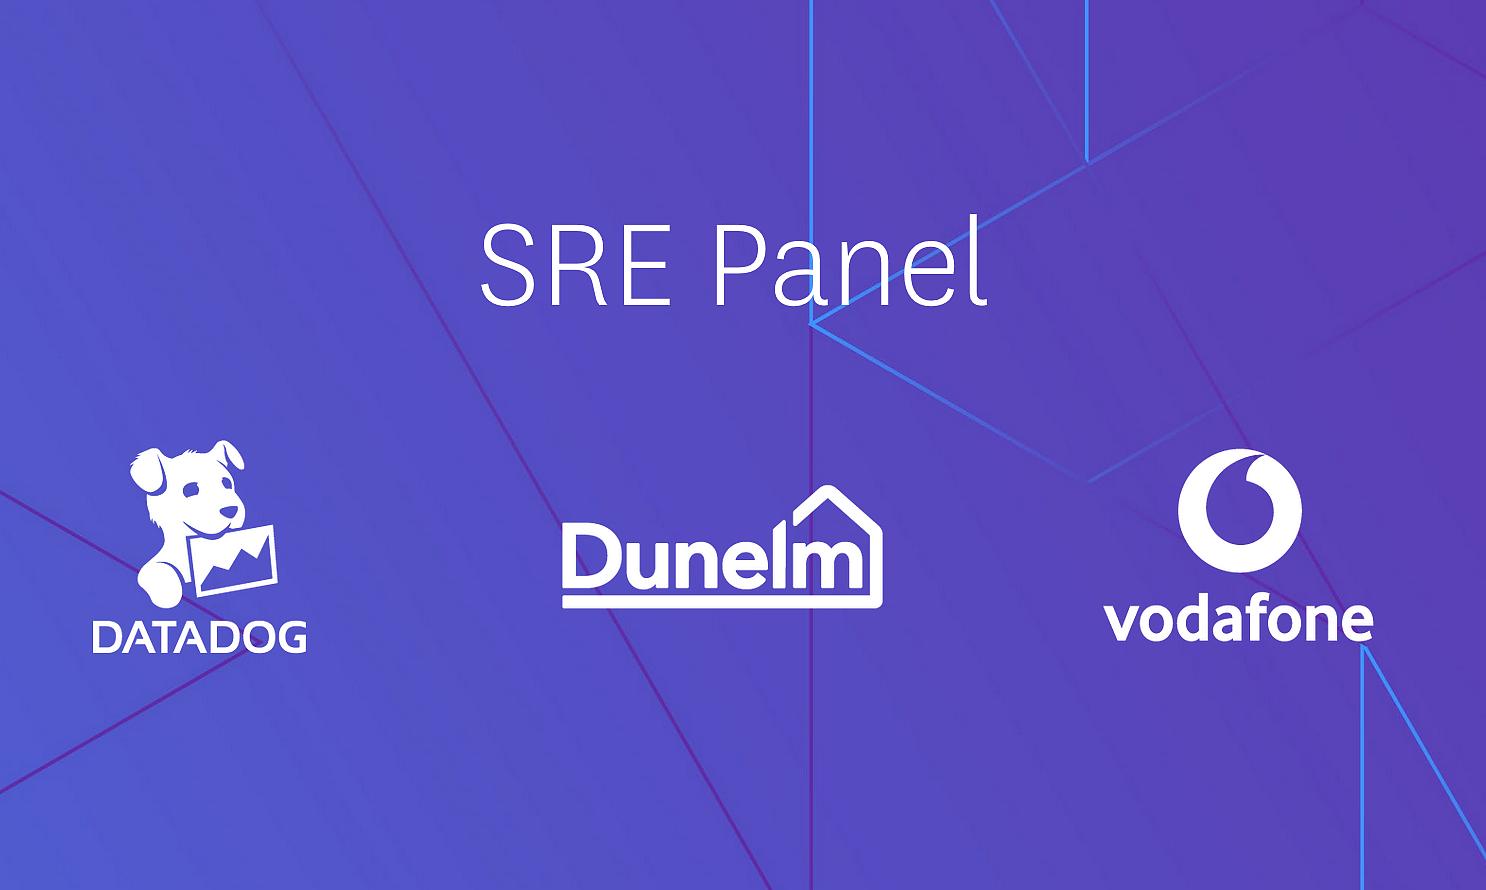 Datadog, Vodafone, and Dunelm SRE Panel discussion